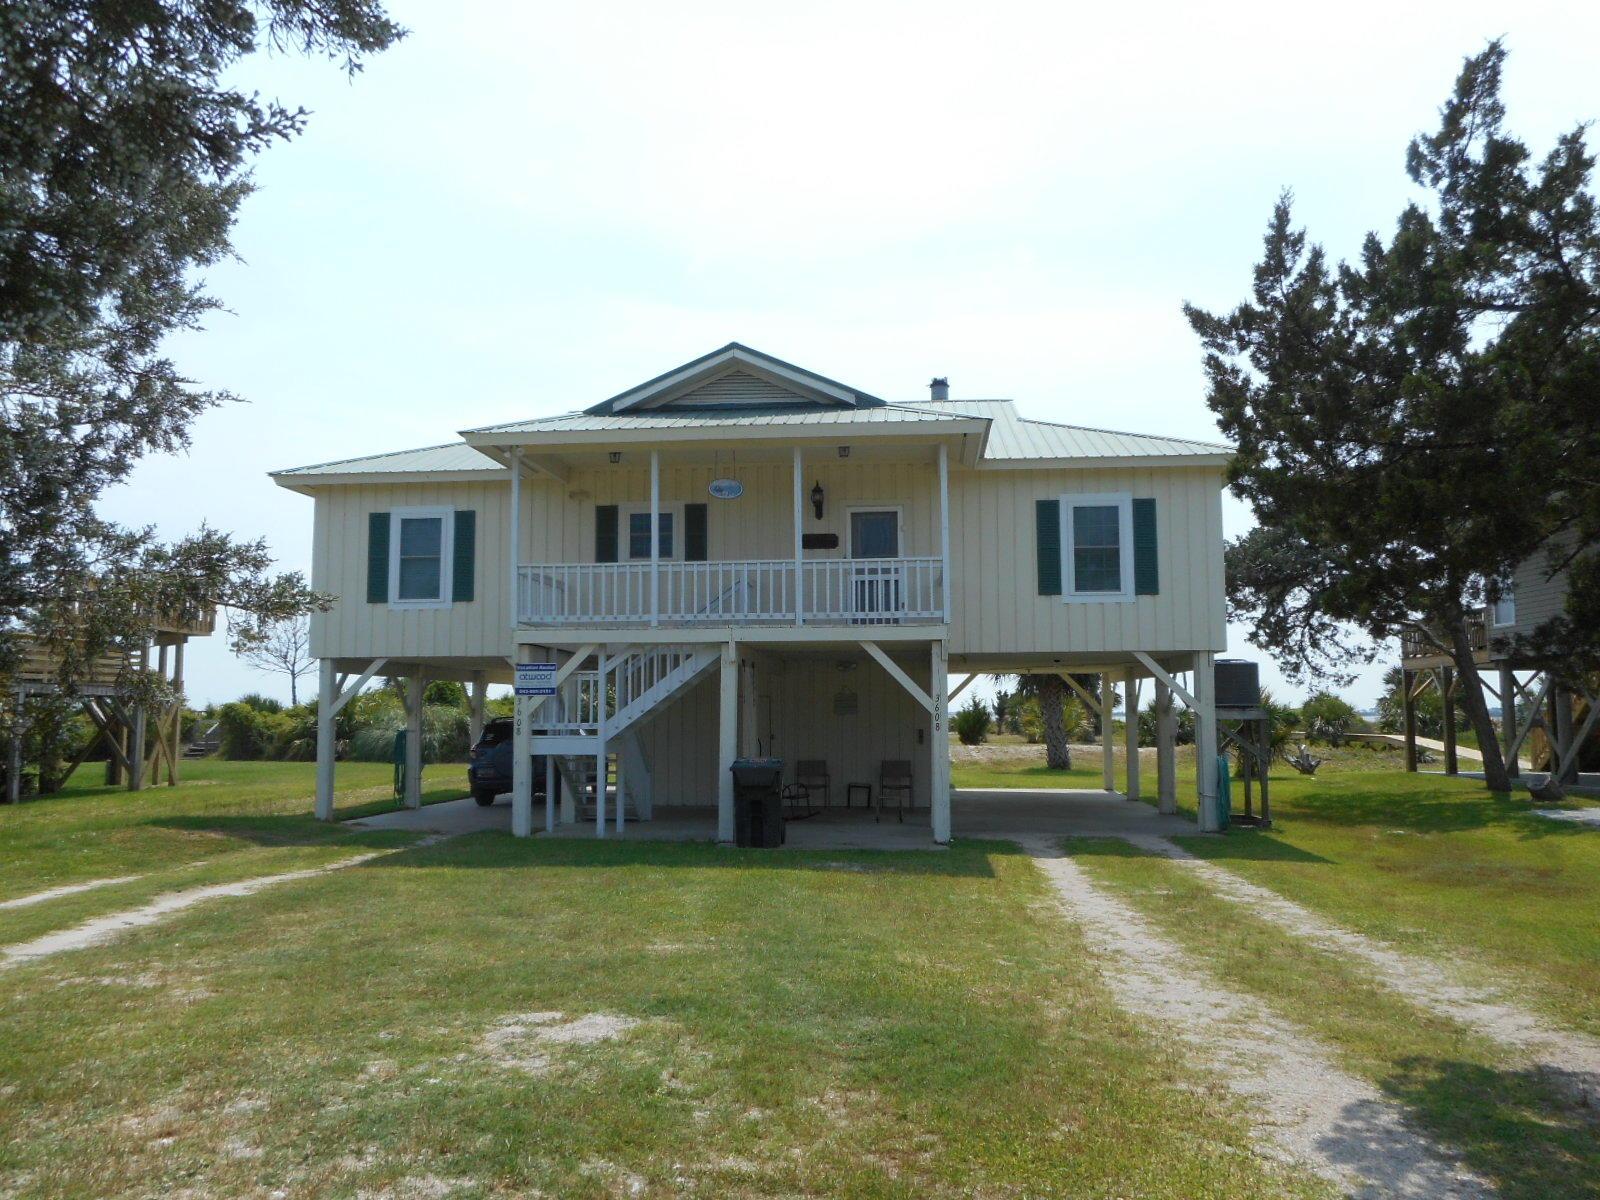 Beachfront Homes For Sale - 3608 Yacht Club, Edisto Beach, SC - 34